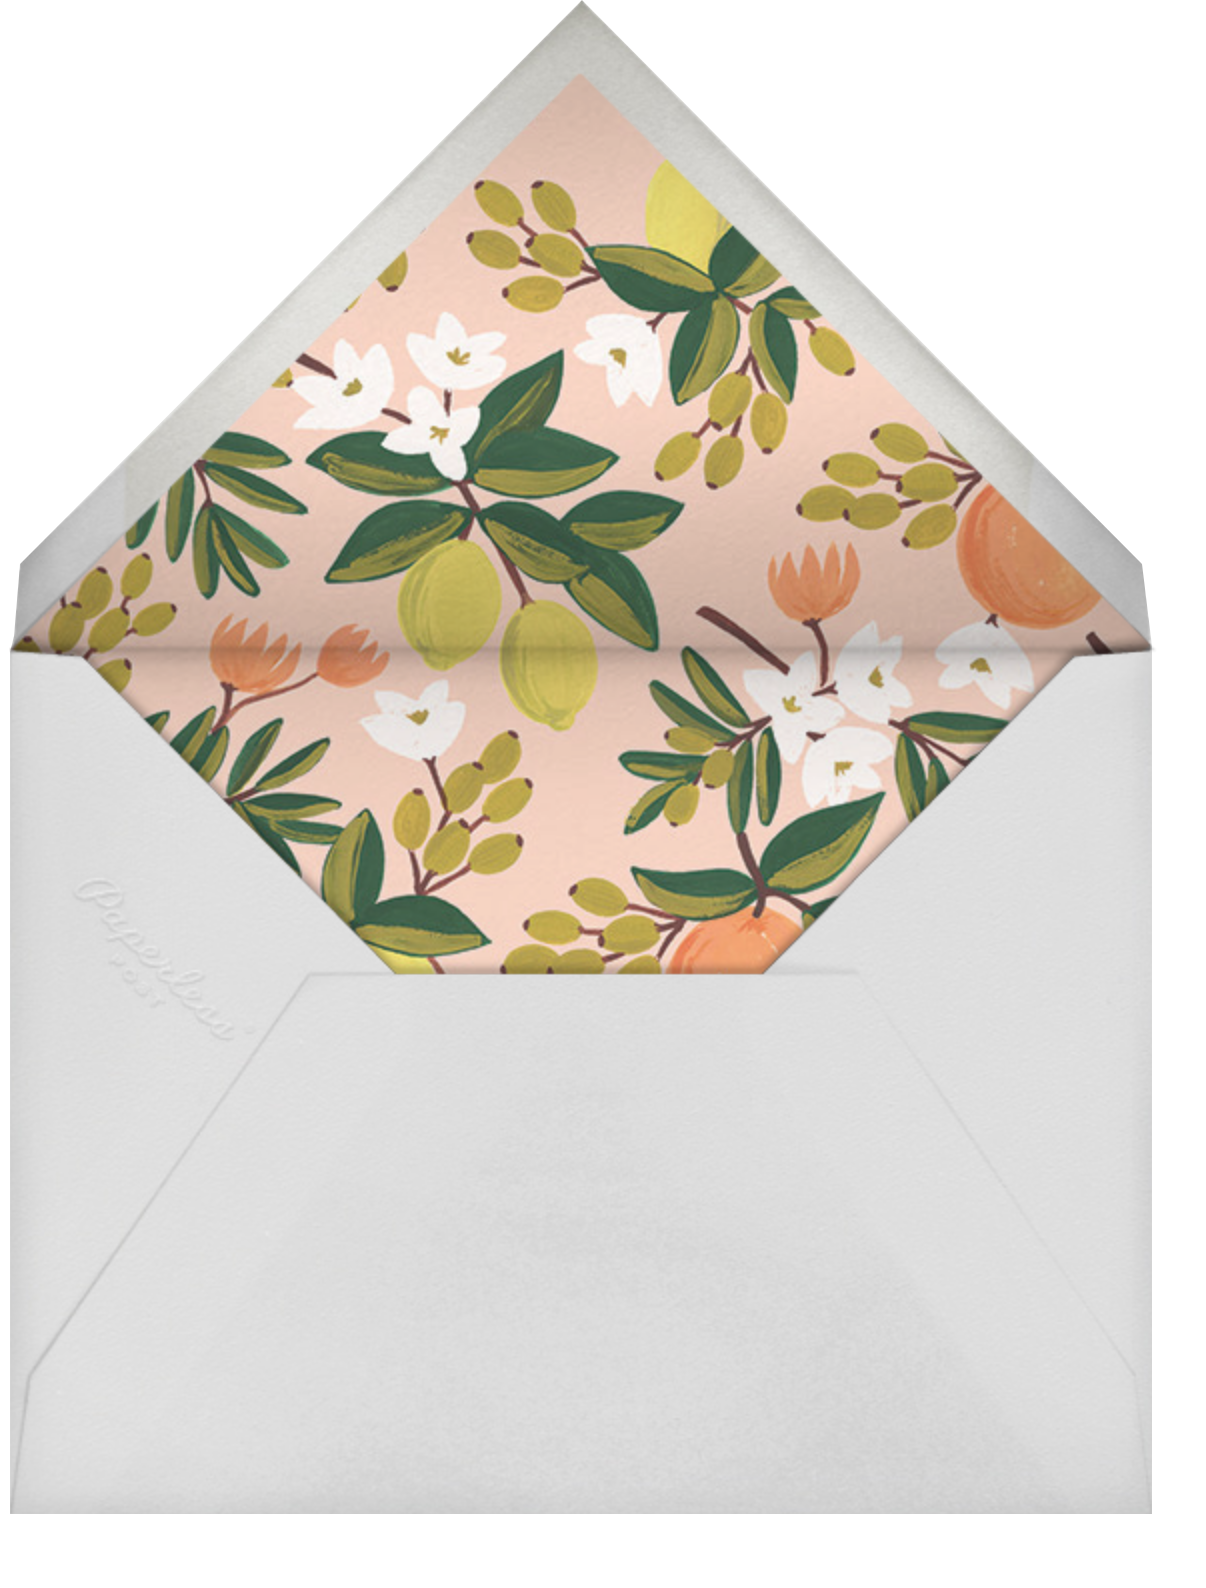 Citrus Orchard Suite (Invitation) - White - Rifle Paper Co. - Envelope